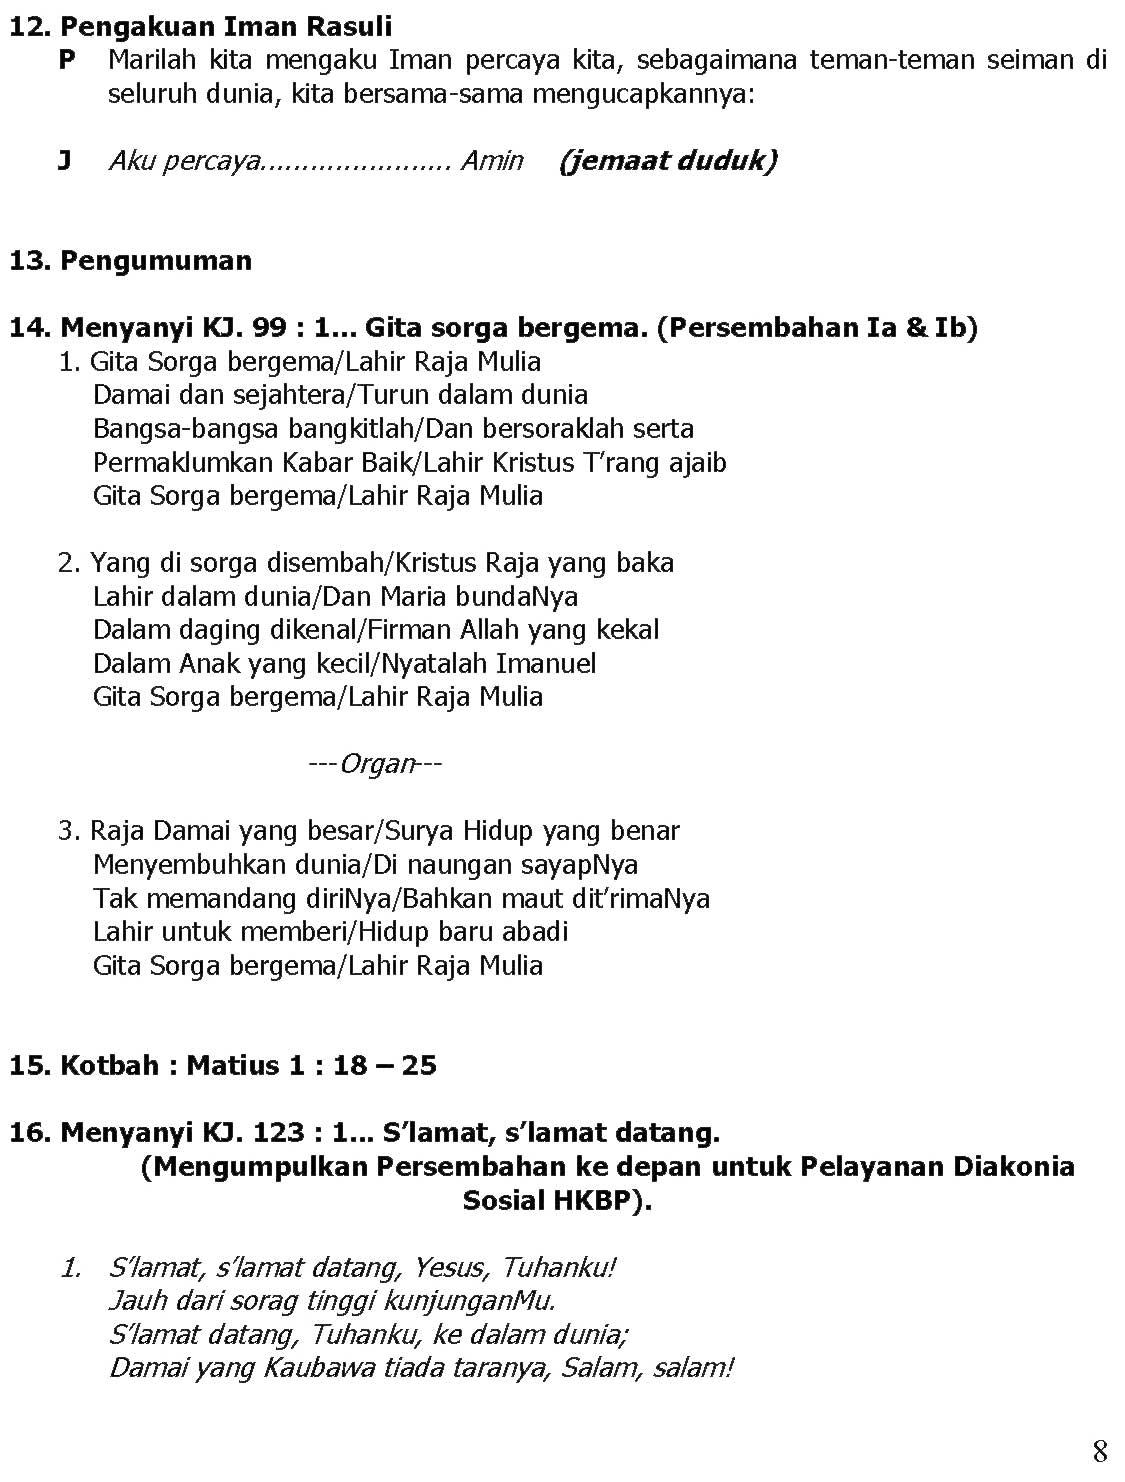 25-Desember-2013-indonesia_08